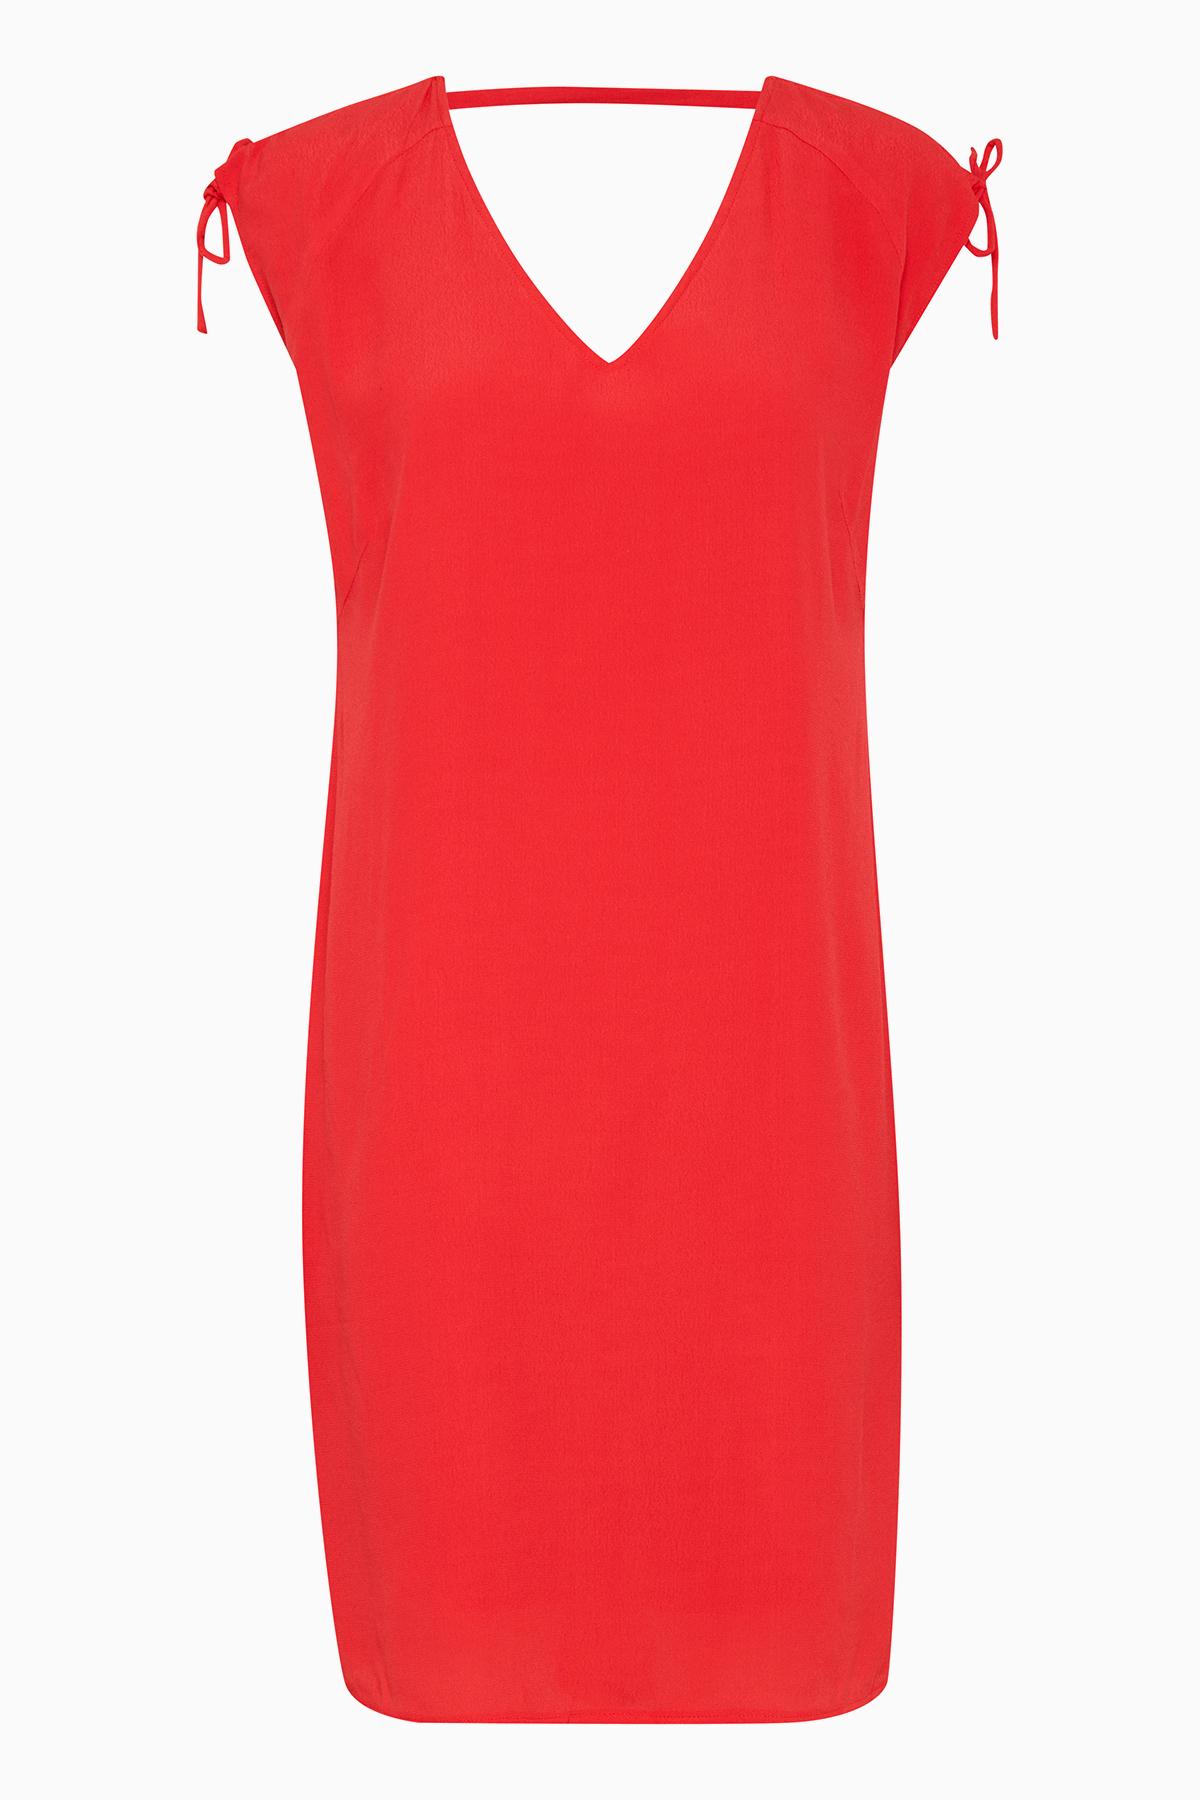 b.young Dame Flot Iritta kjole - Rød